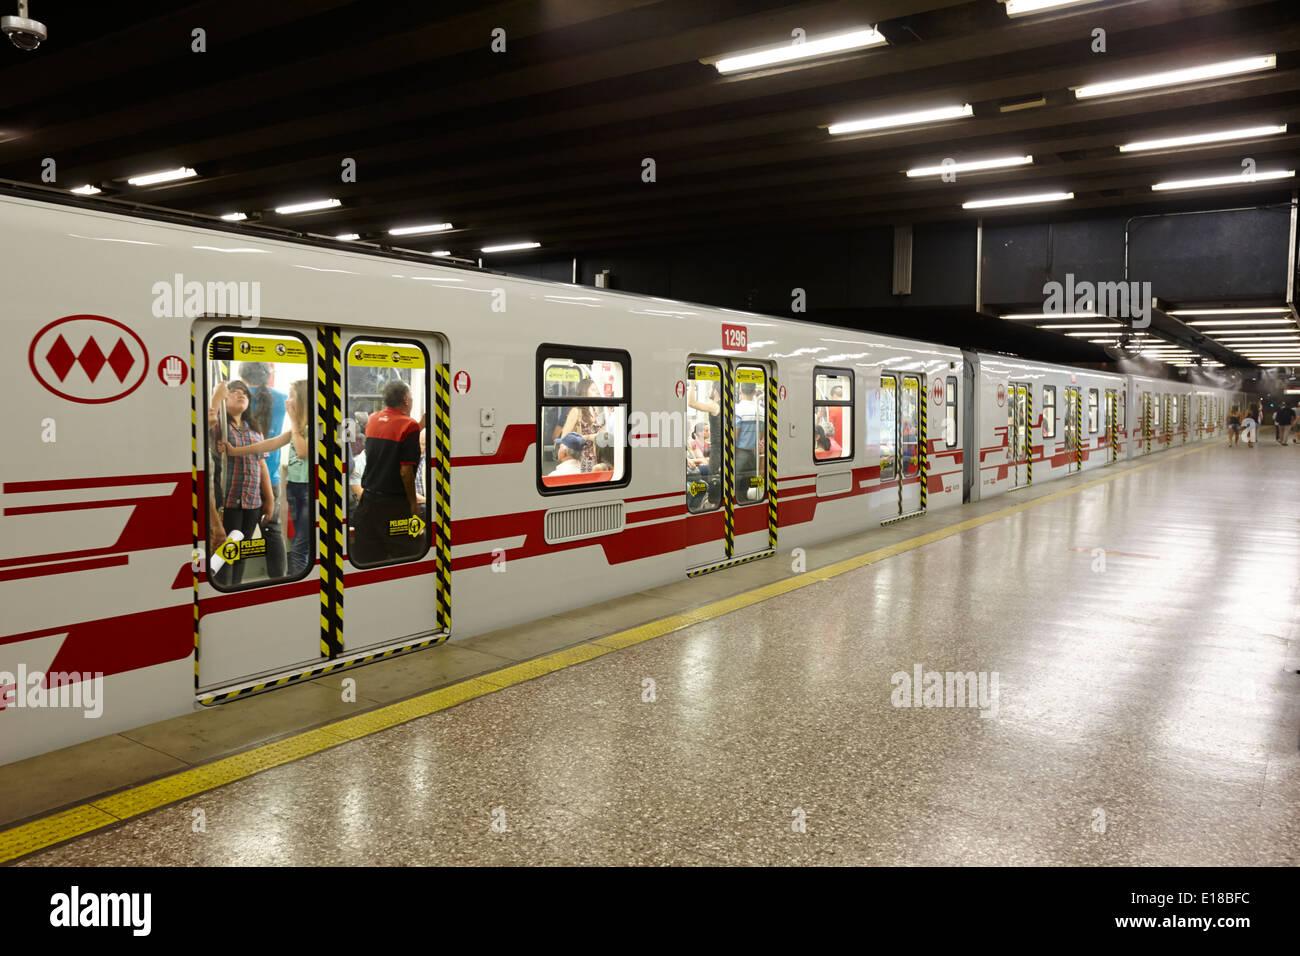 universidad de chile metro station downtown Santiago Chile - Stock Image